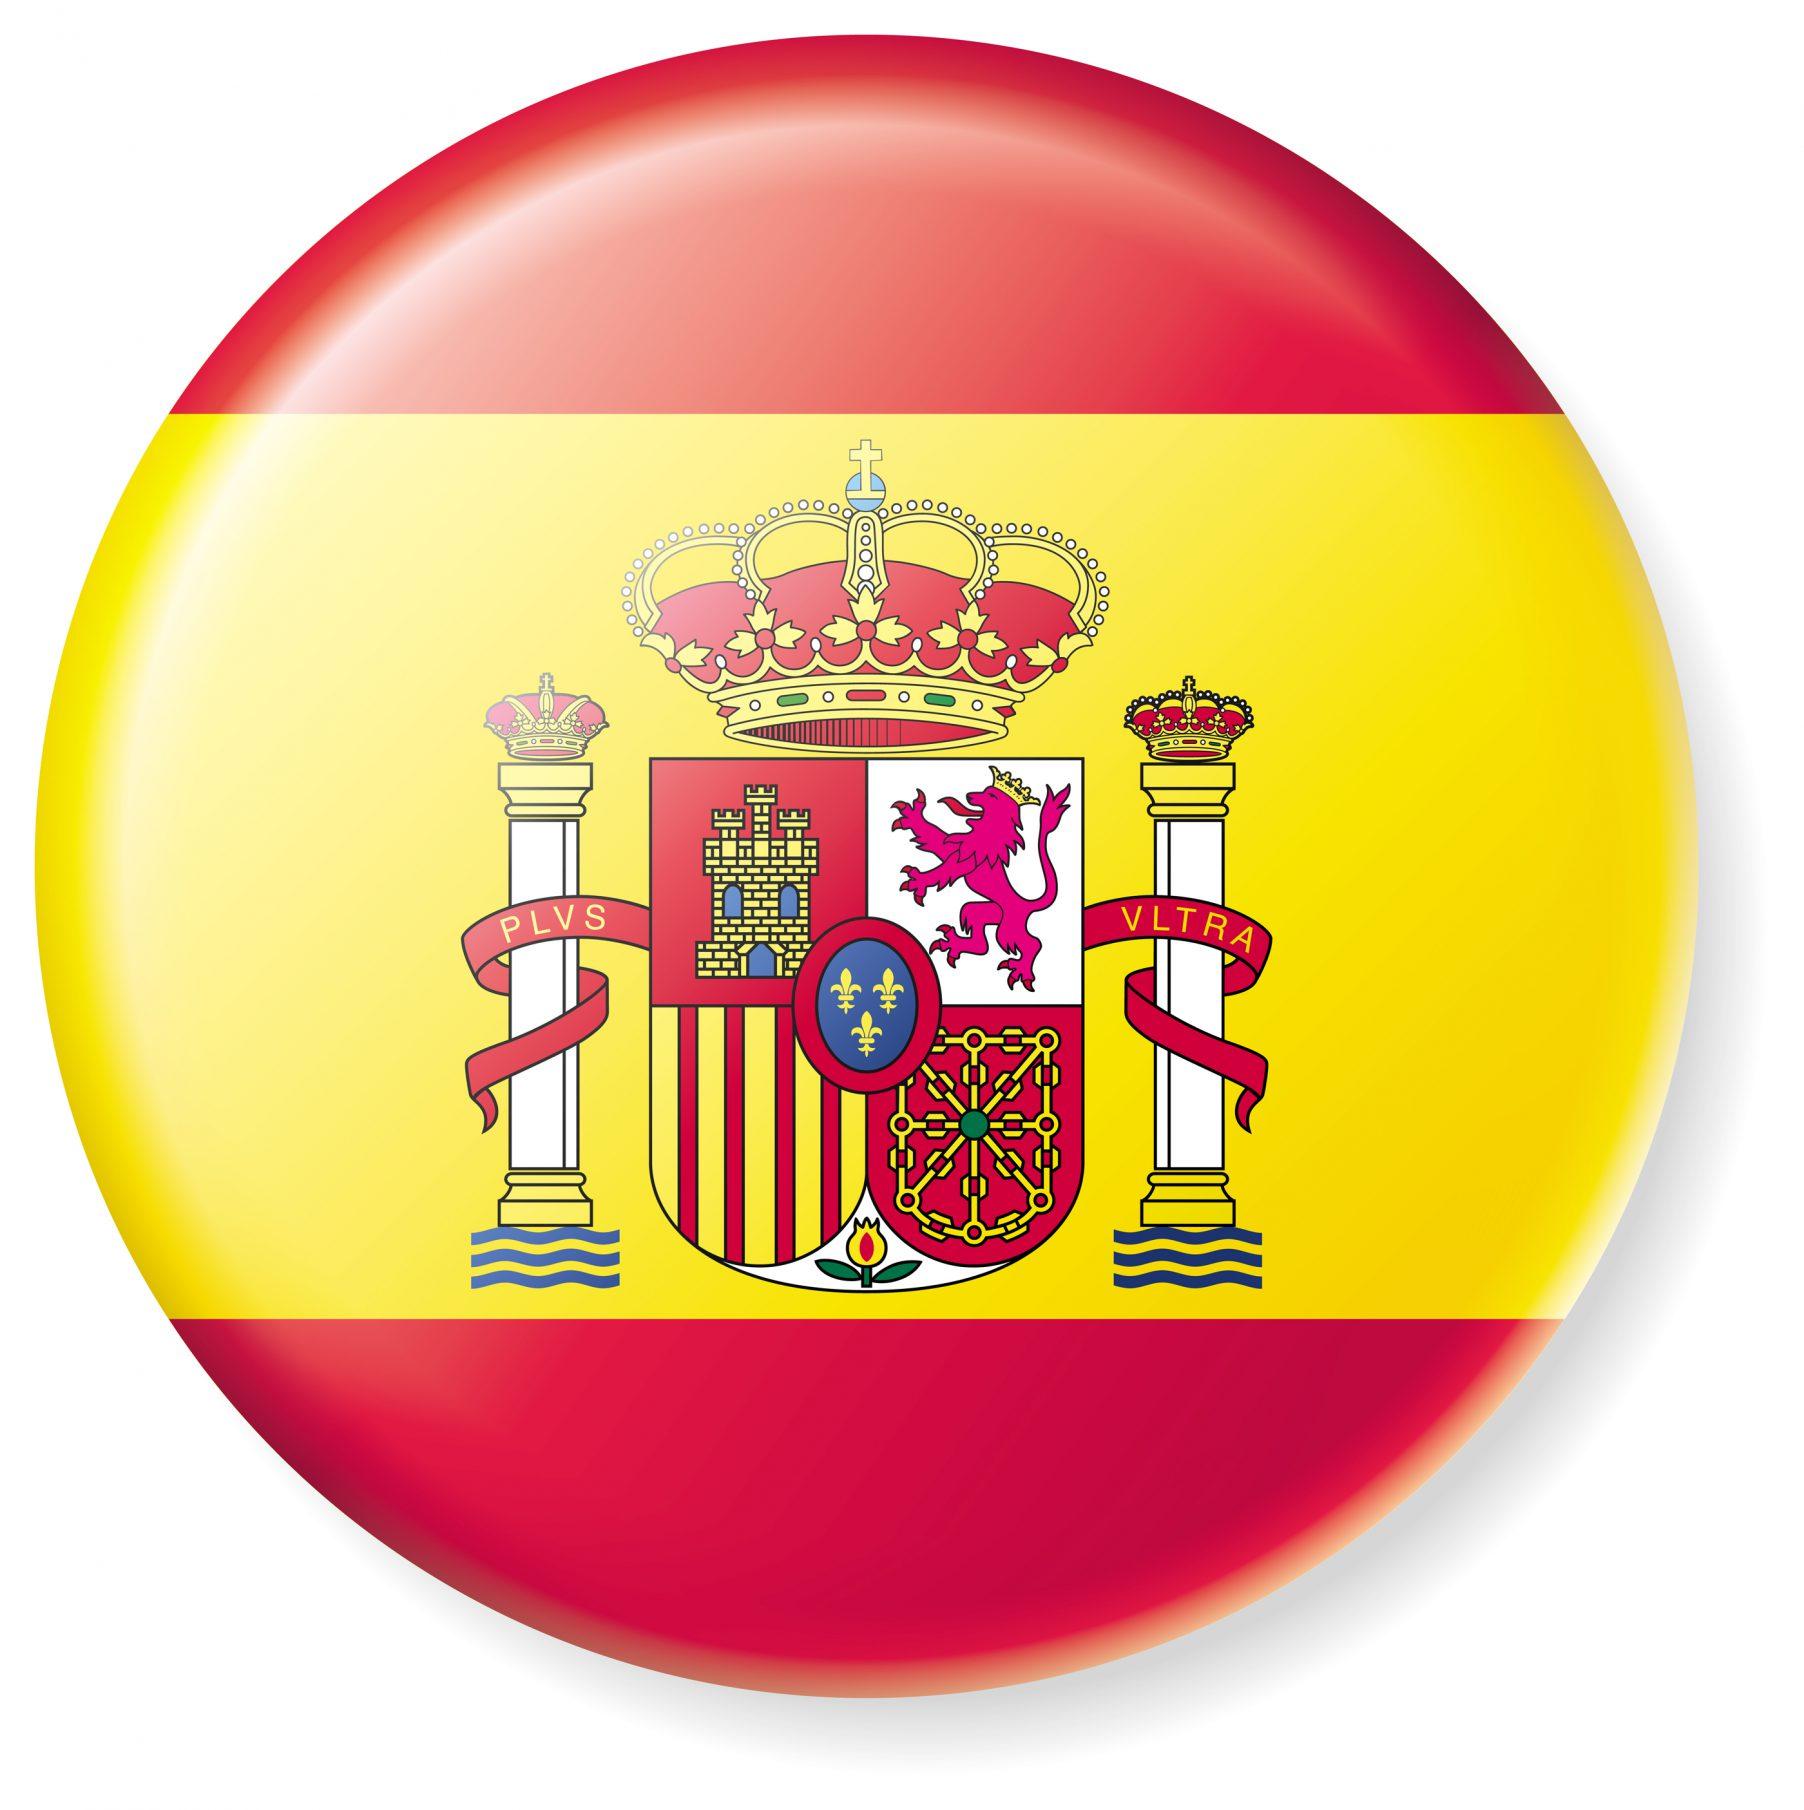 Espagnol fantadys - Image drapeau espagnol a imprimer ...